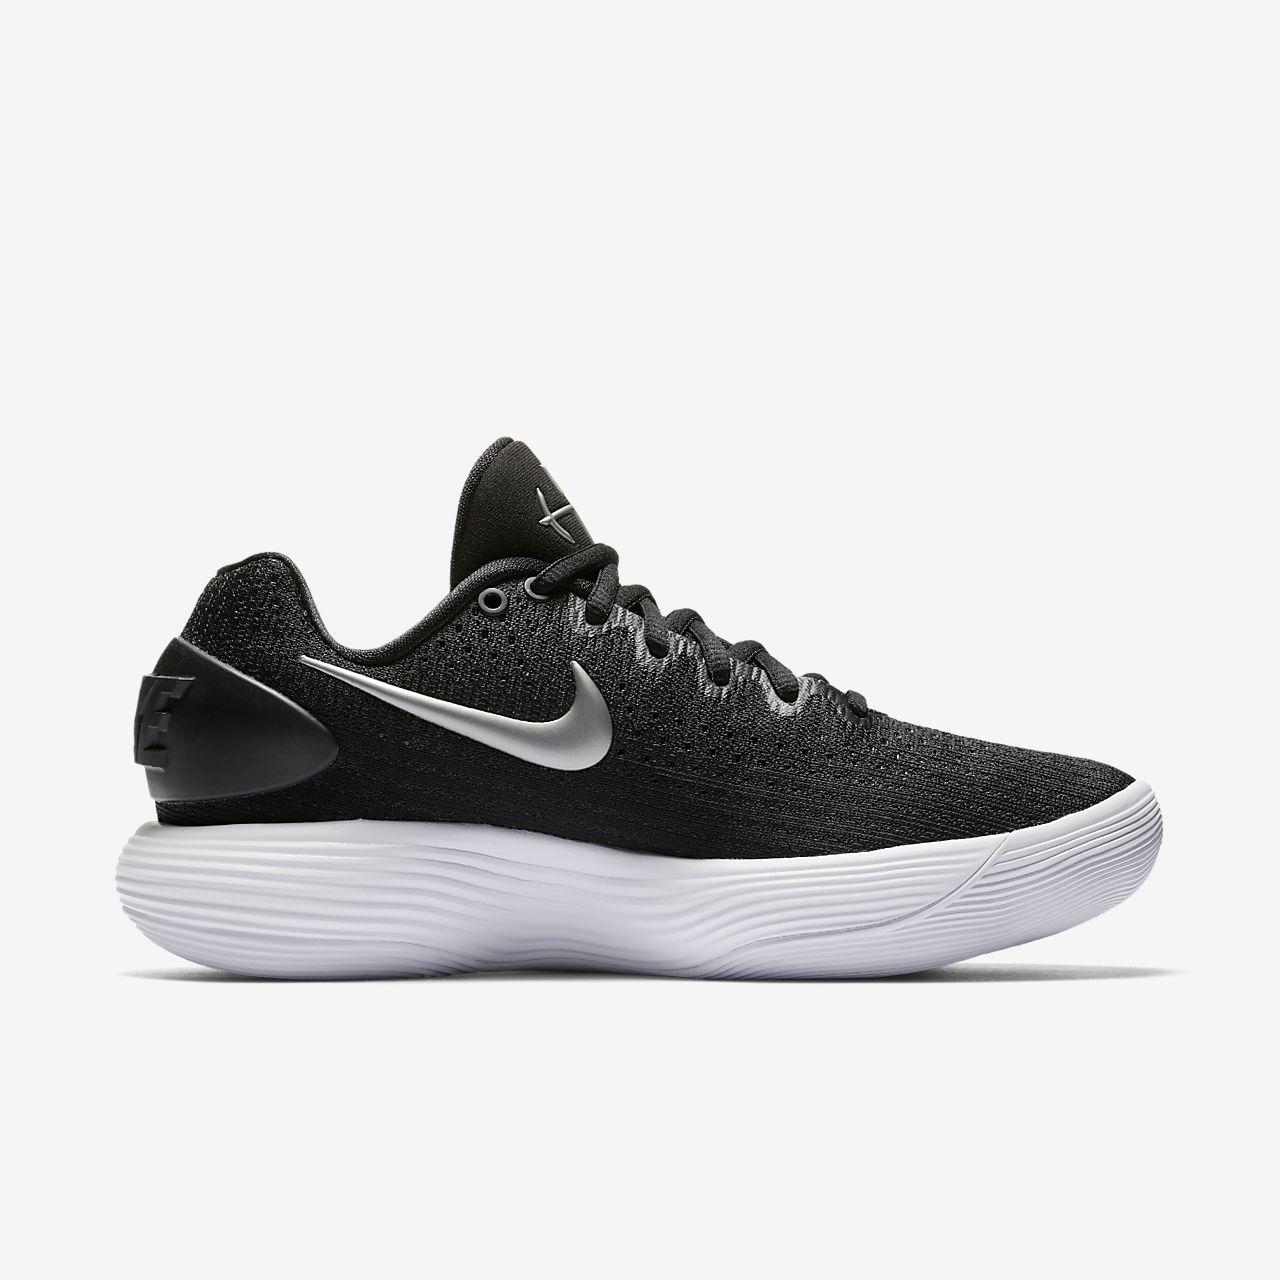 Nike Chaussures De Basket-ball Pour Femmes 1dzsQ